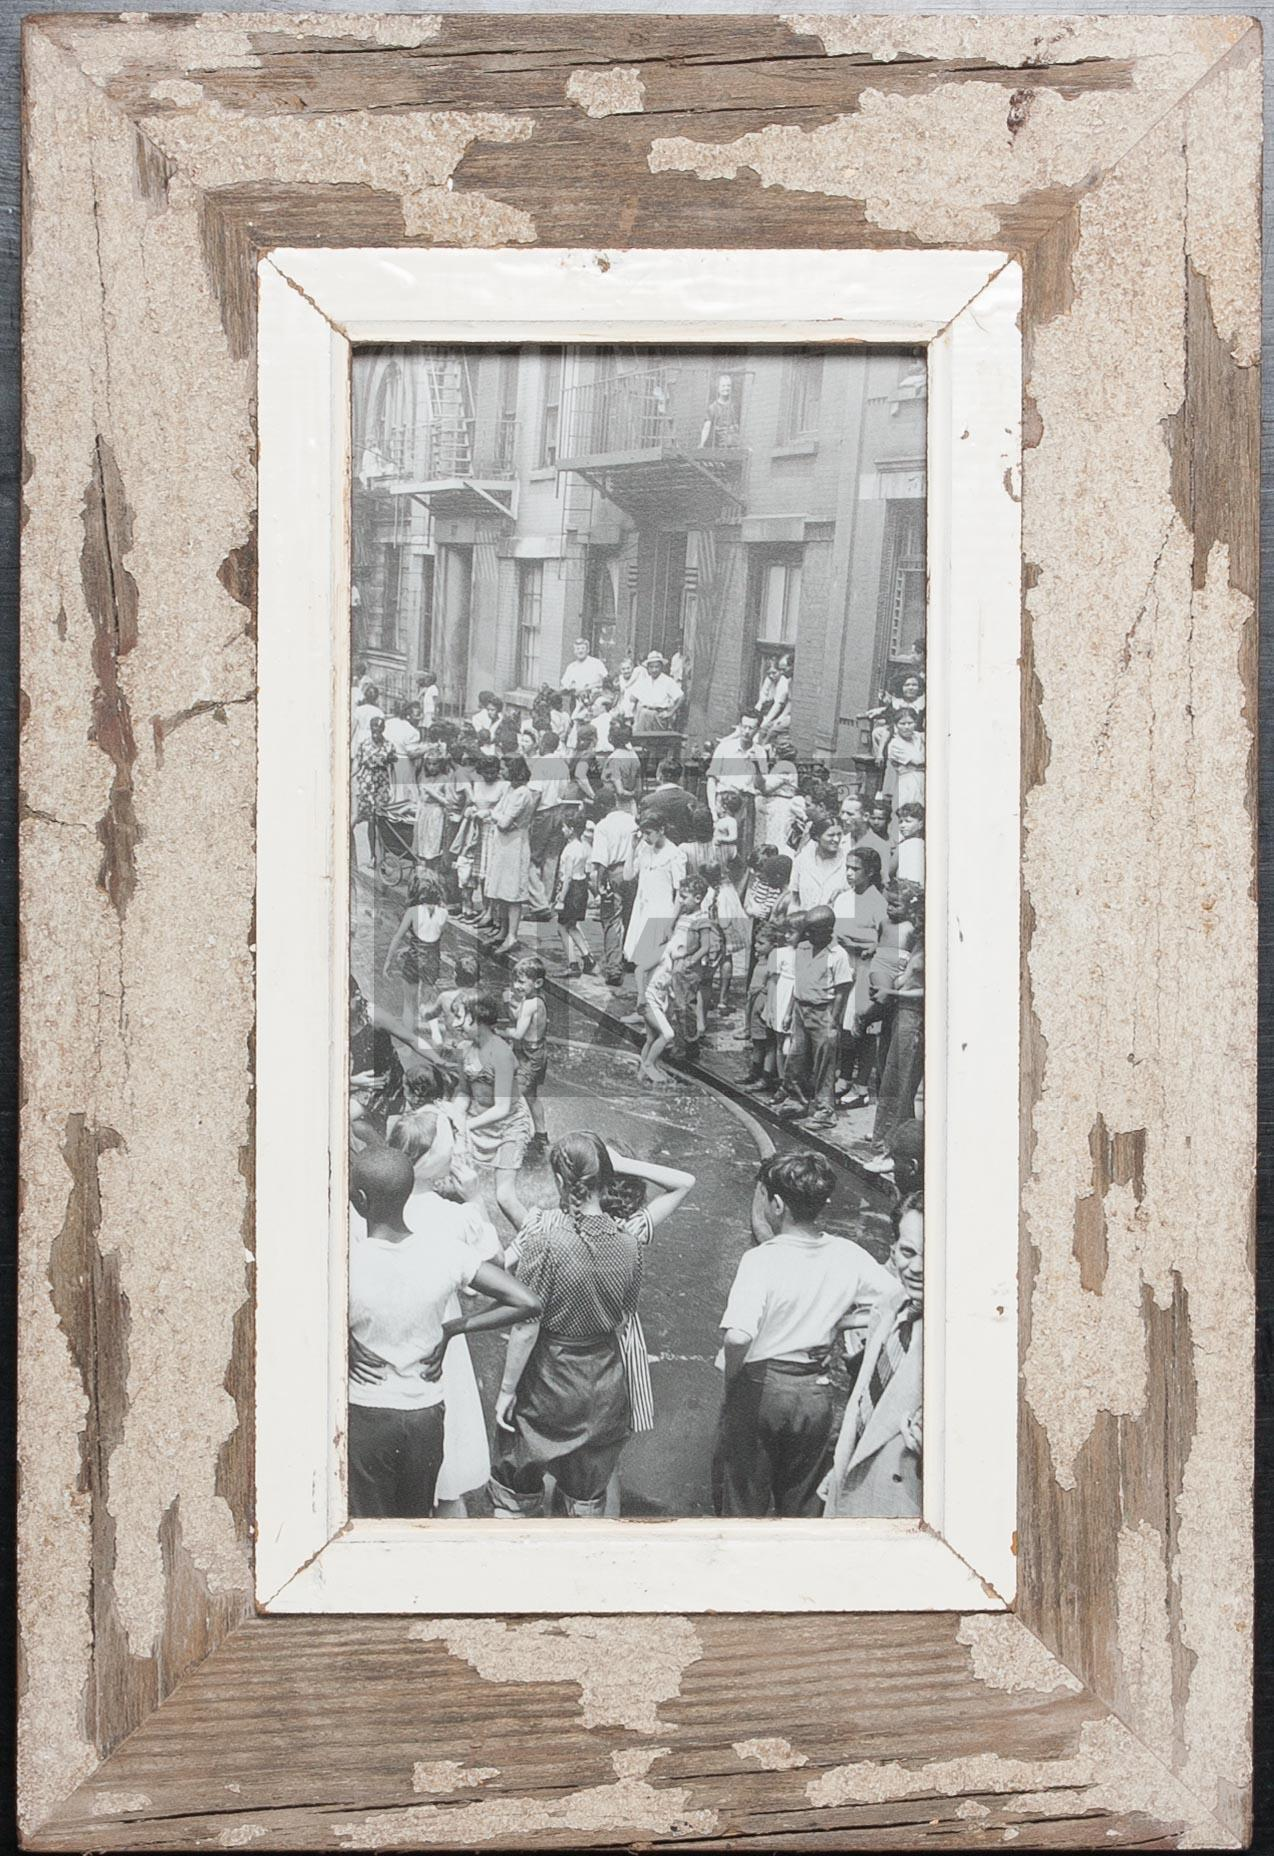 Panorama-Vintage-Bilderrahmen